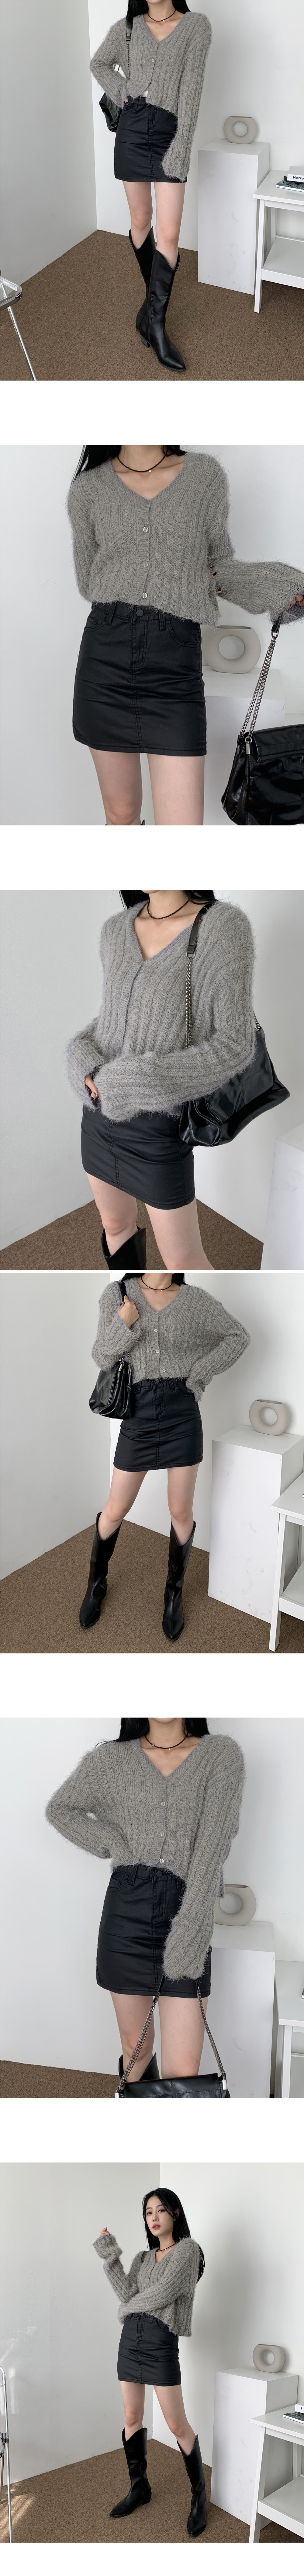 Rev Fur V-Neck Crop Knitwear Cardigan